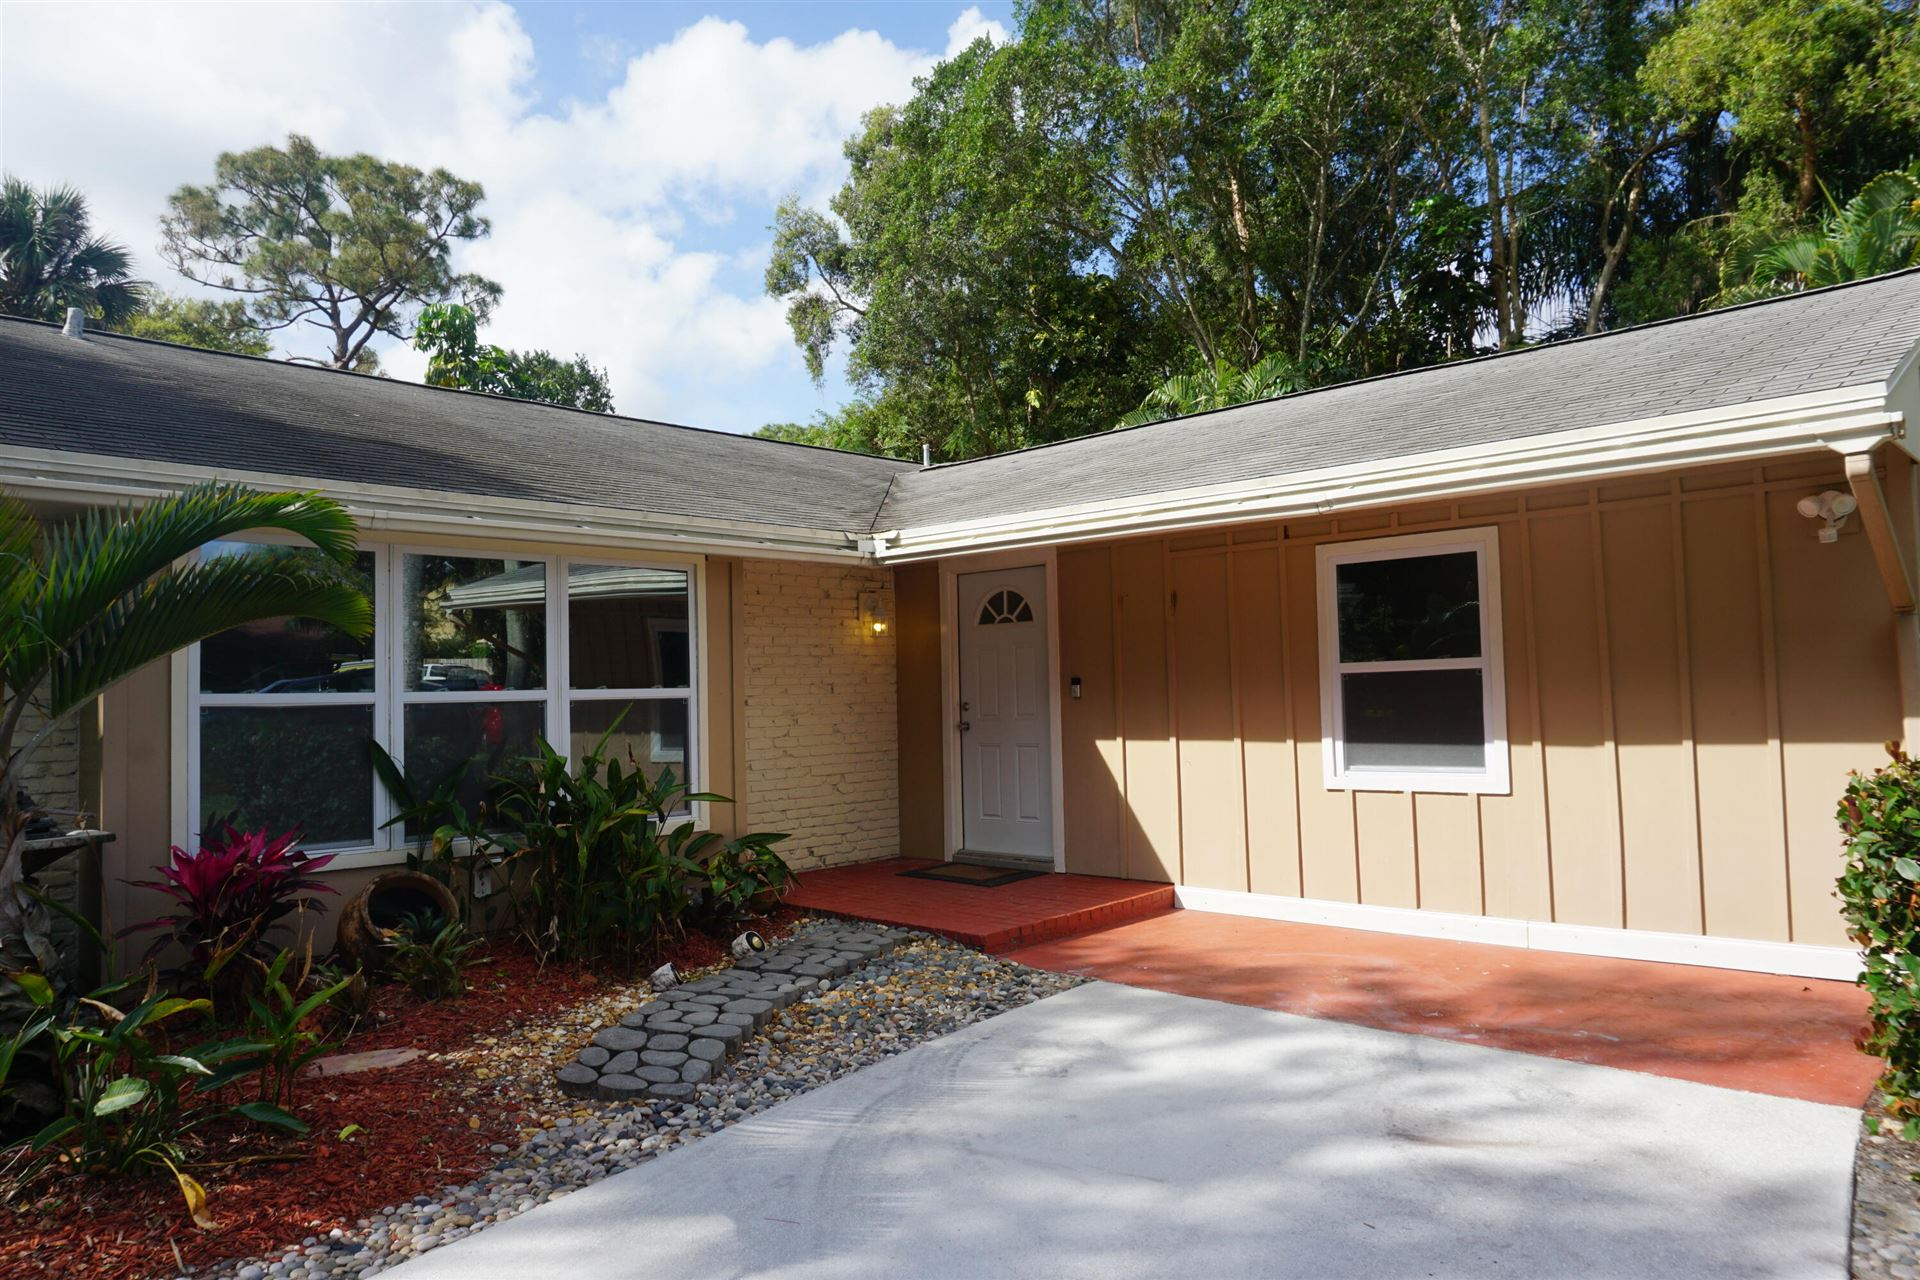 4576 Woodmere Lane, Lake Worth, FL 33463 - #: RX-10693826